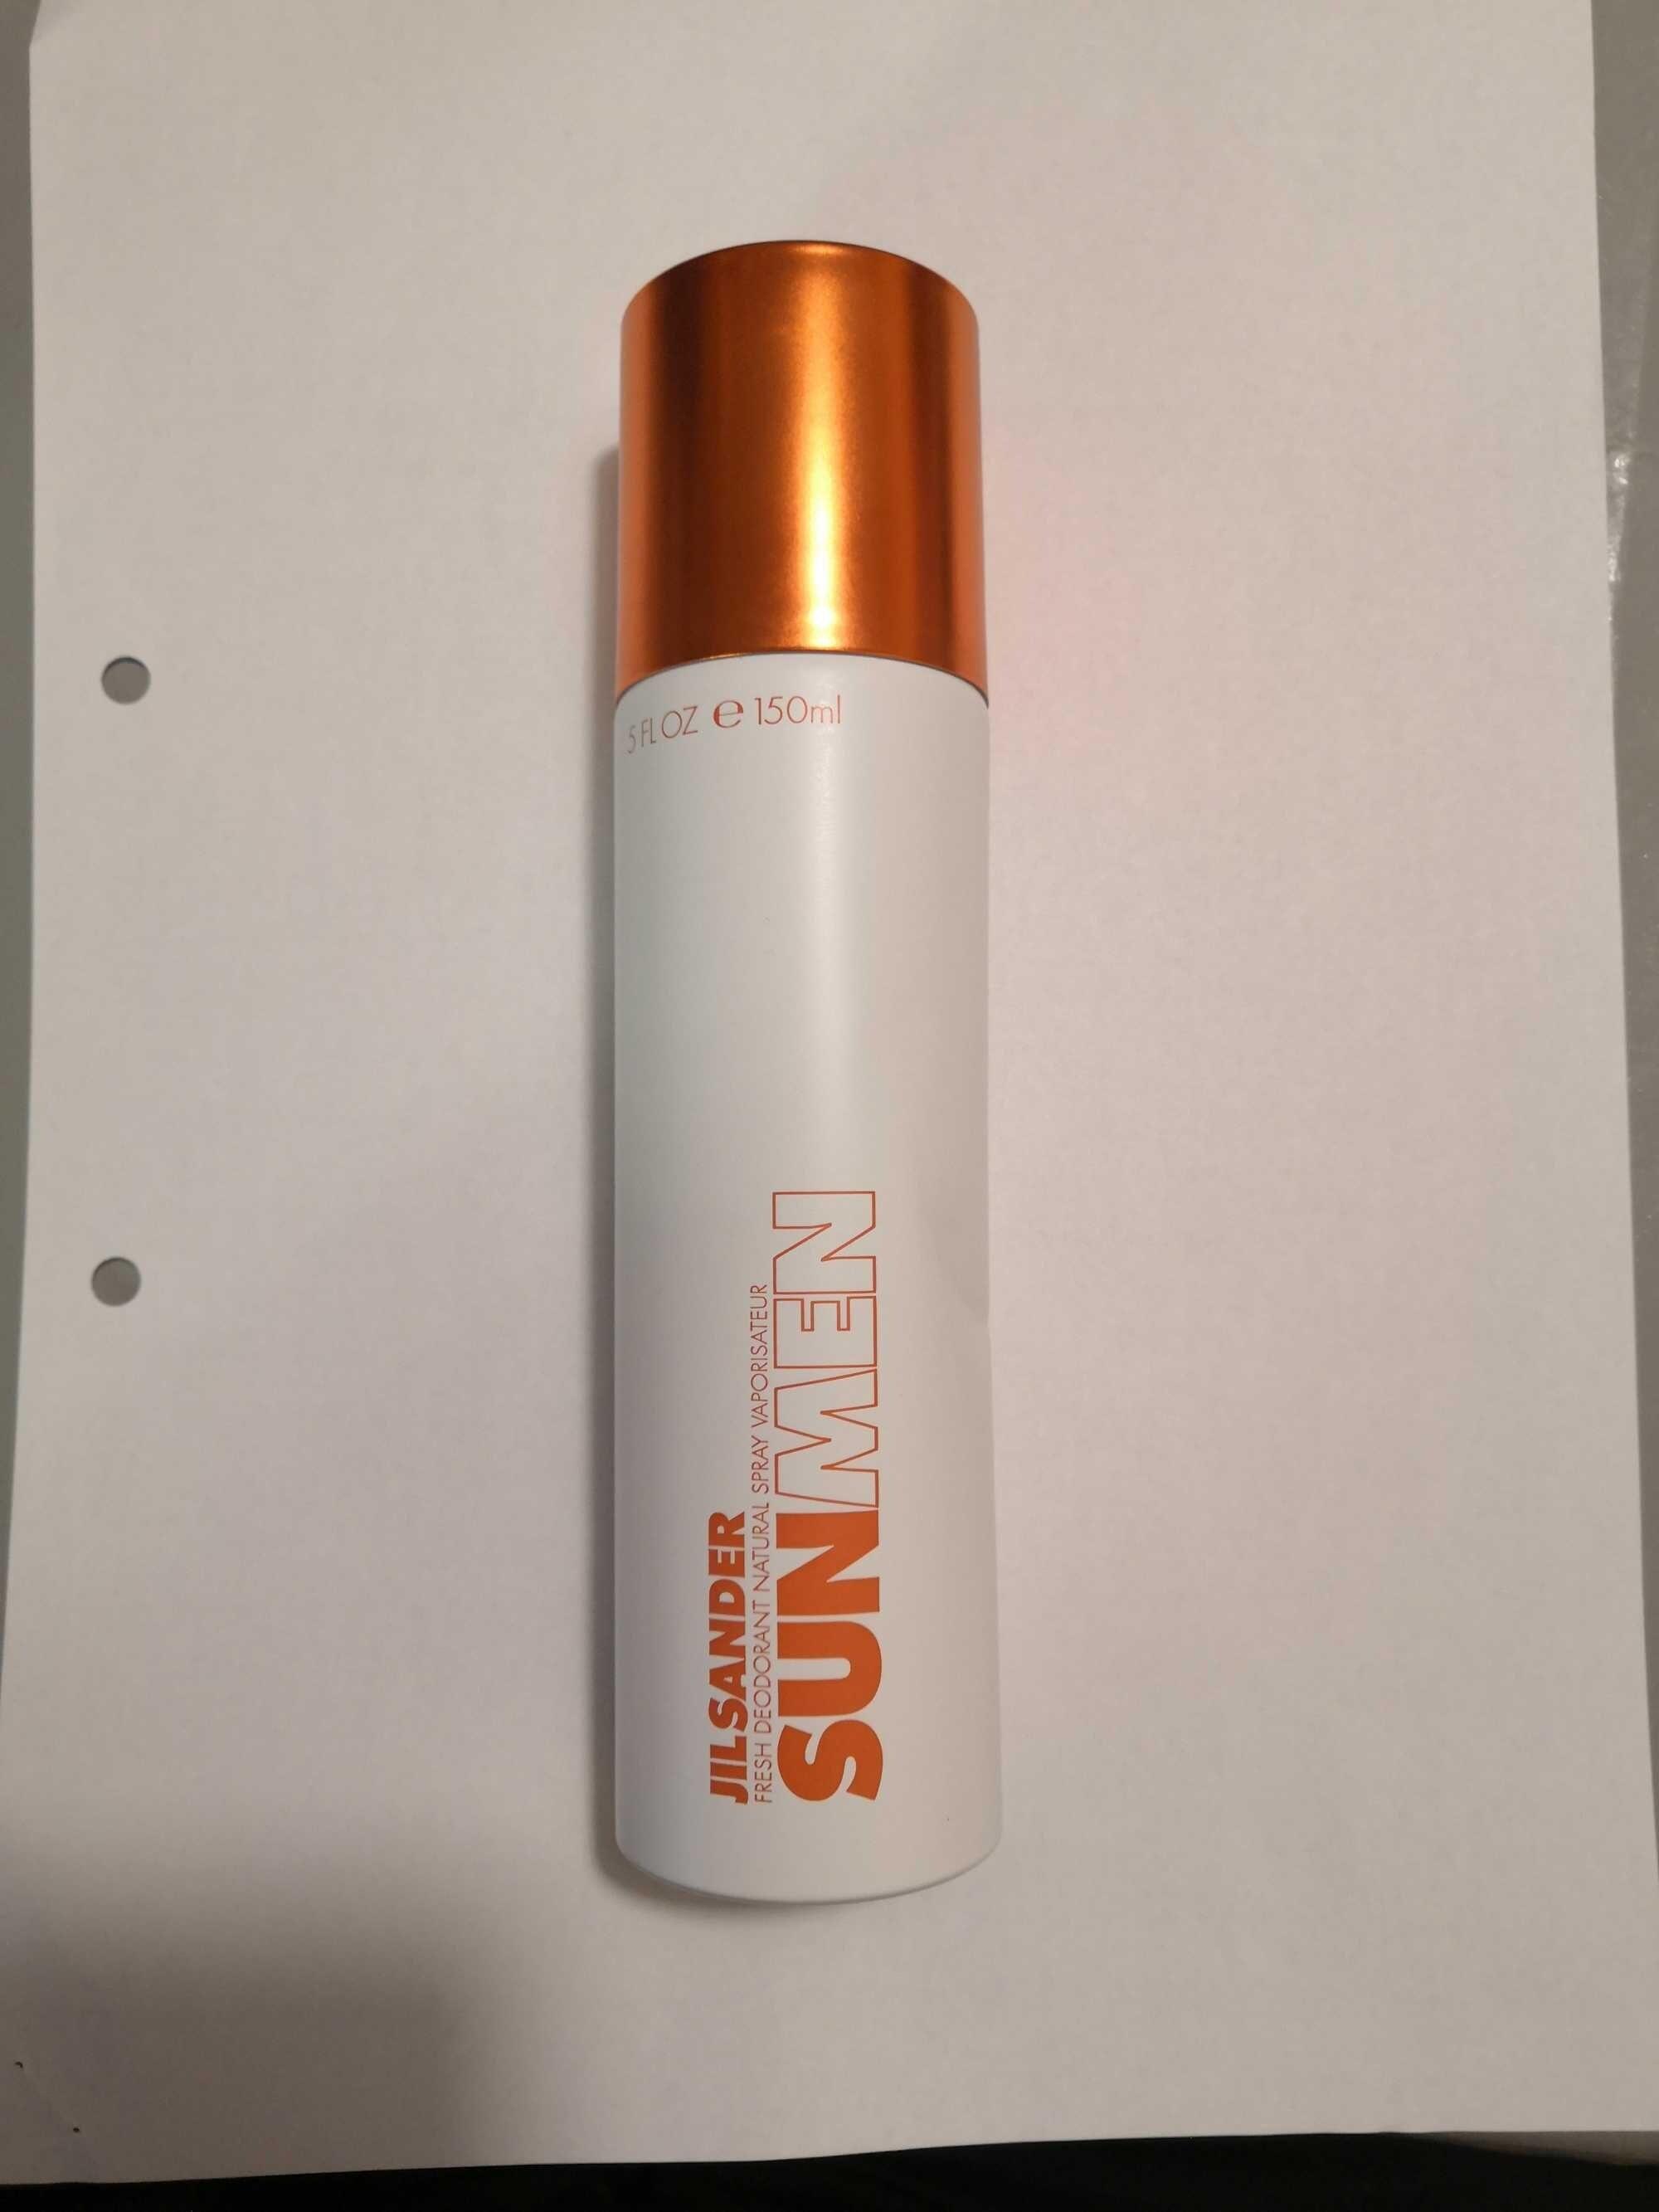 Jil Sander Sun Men - Product - de